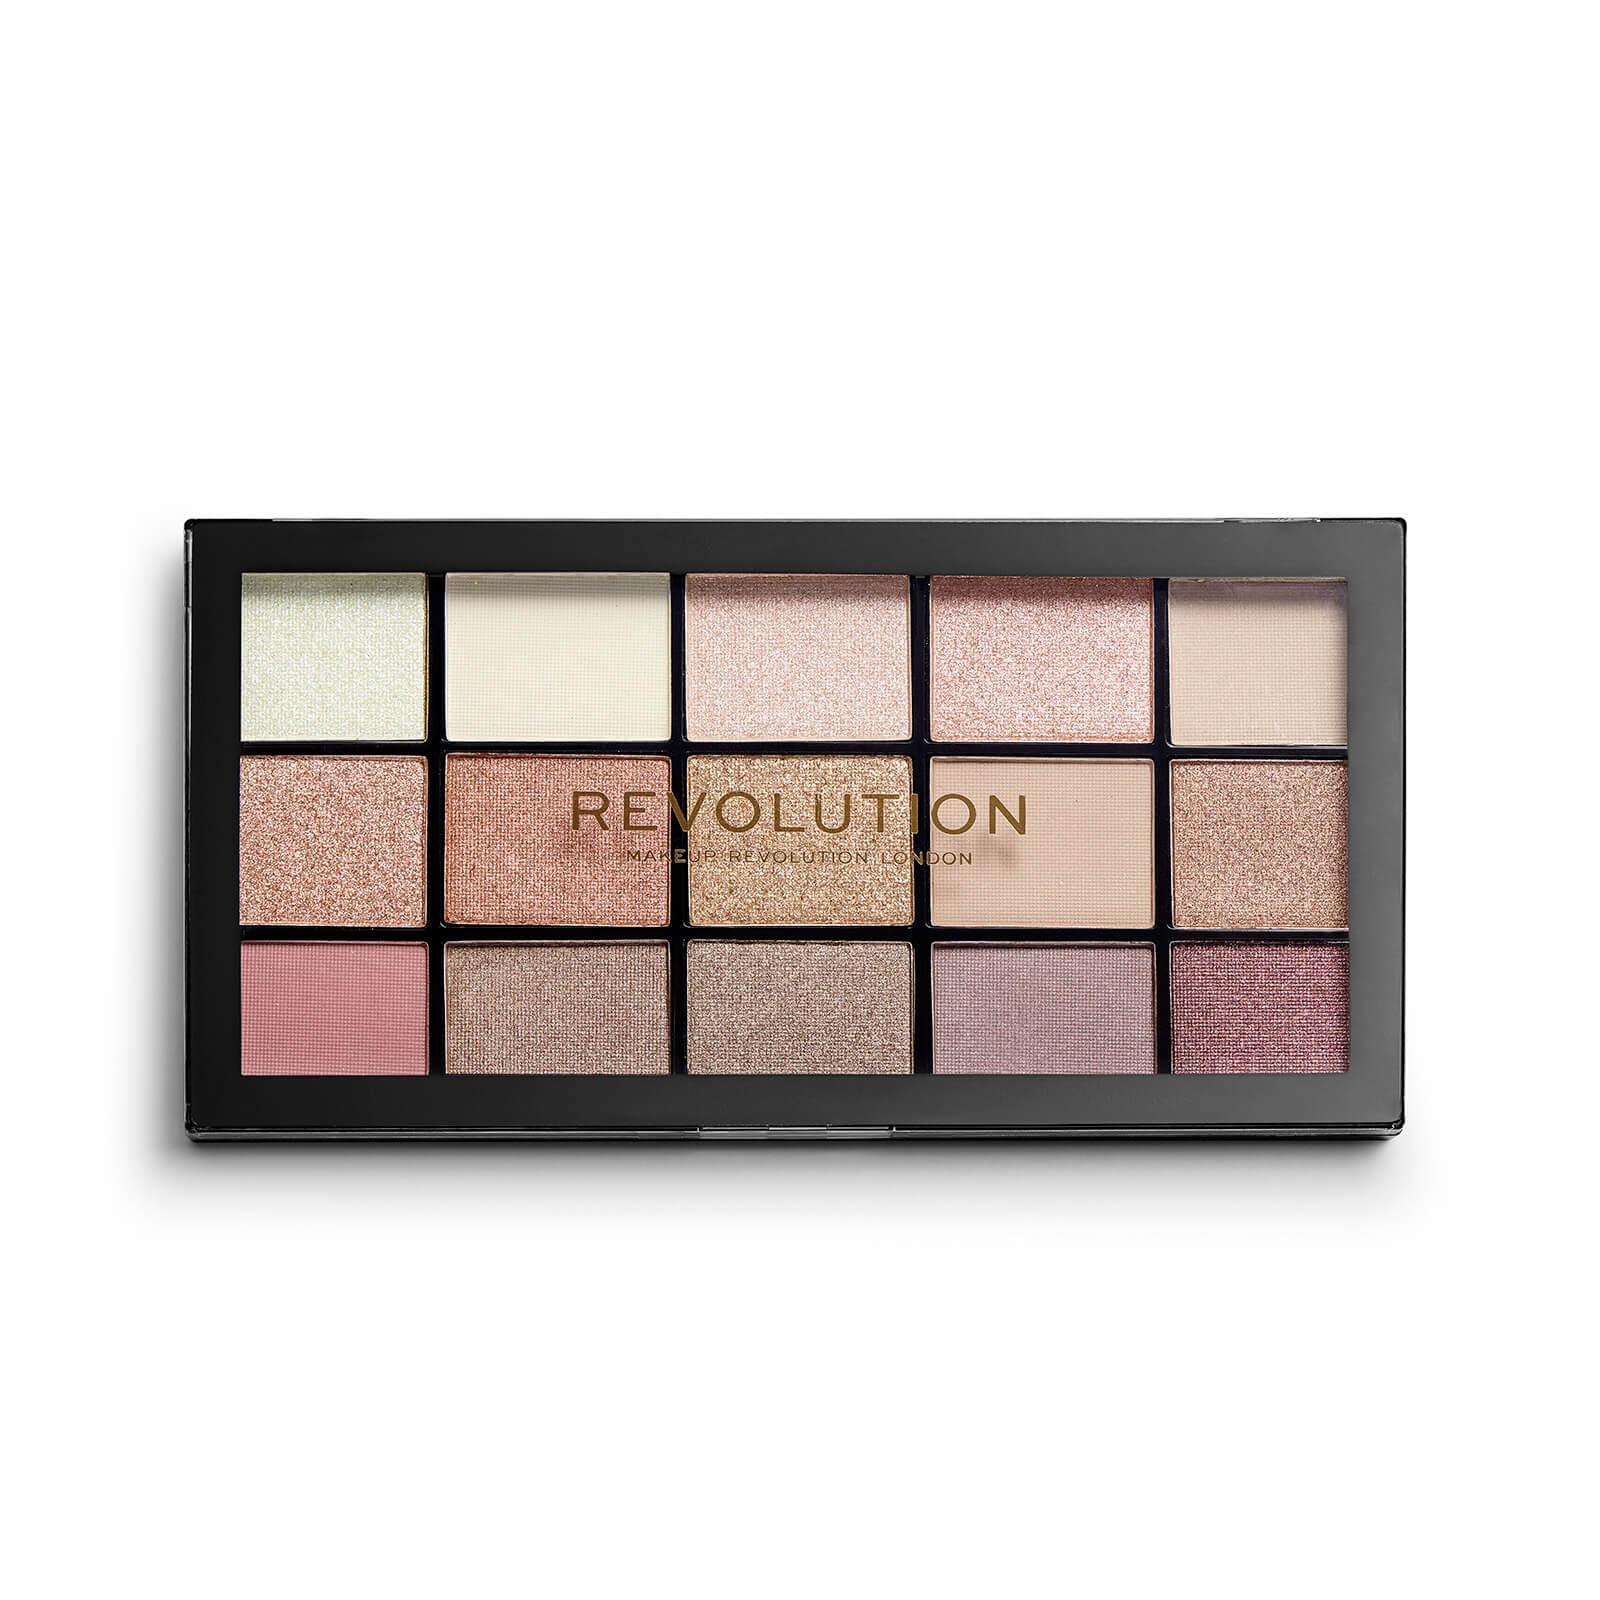 Купить Revolution Beauty Reloaded Palette Iconic 3.0